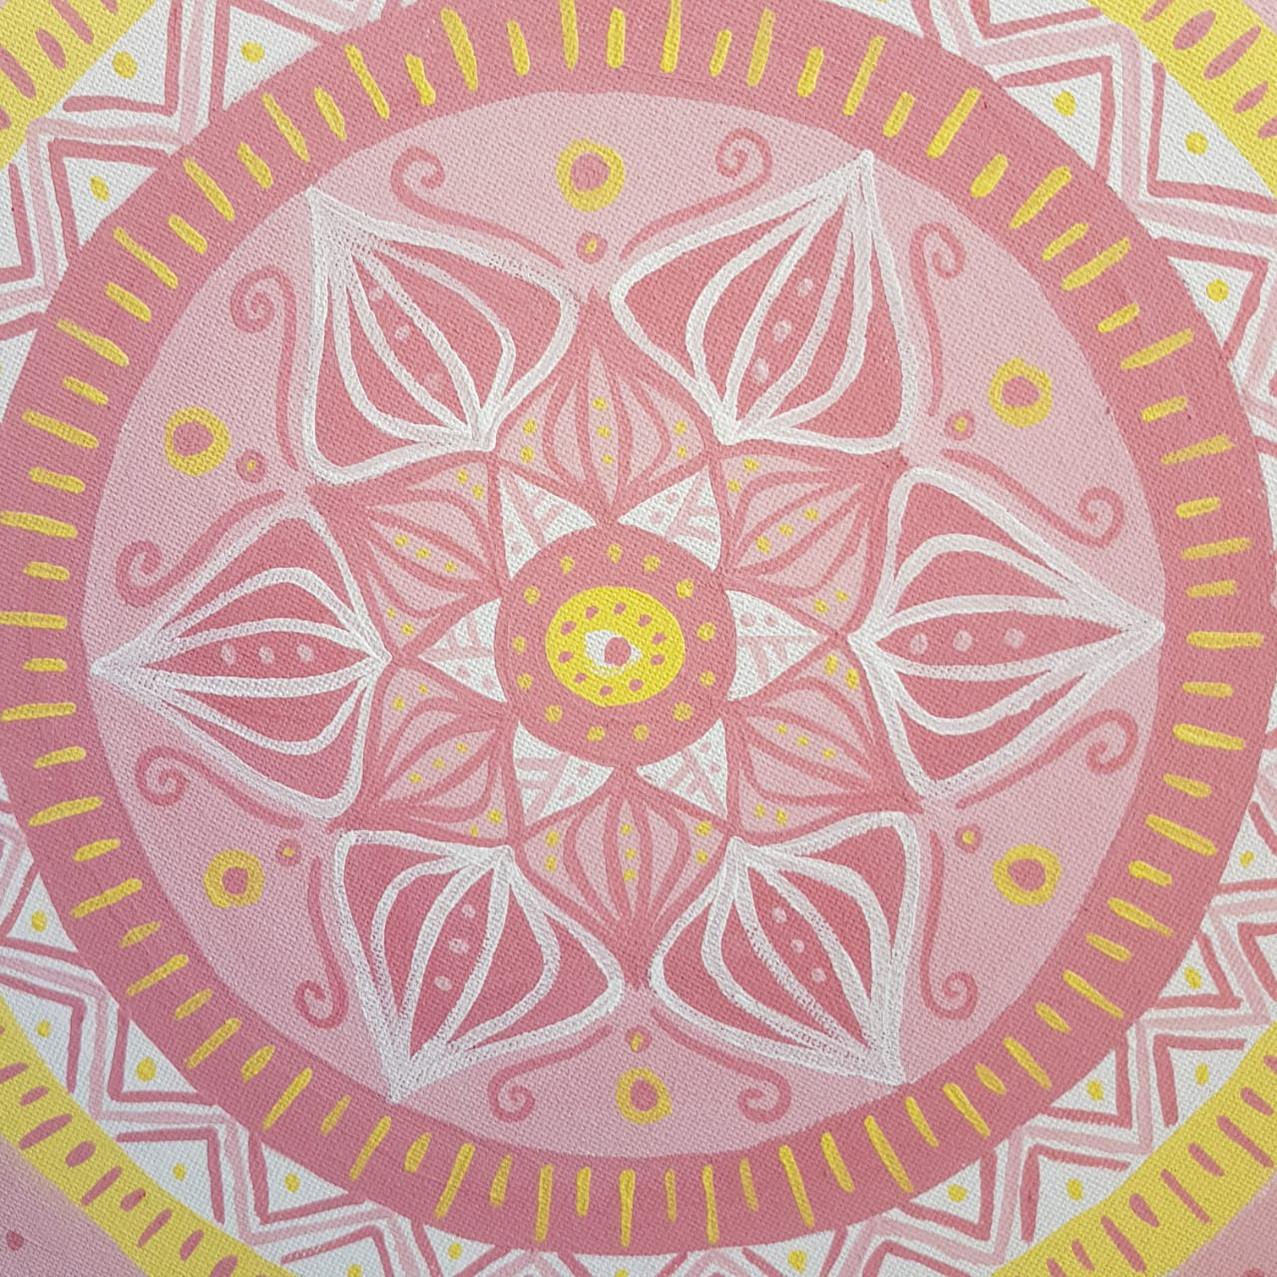 Mandala on canvas atwork